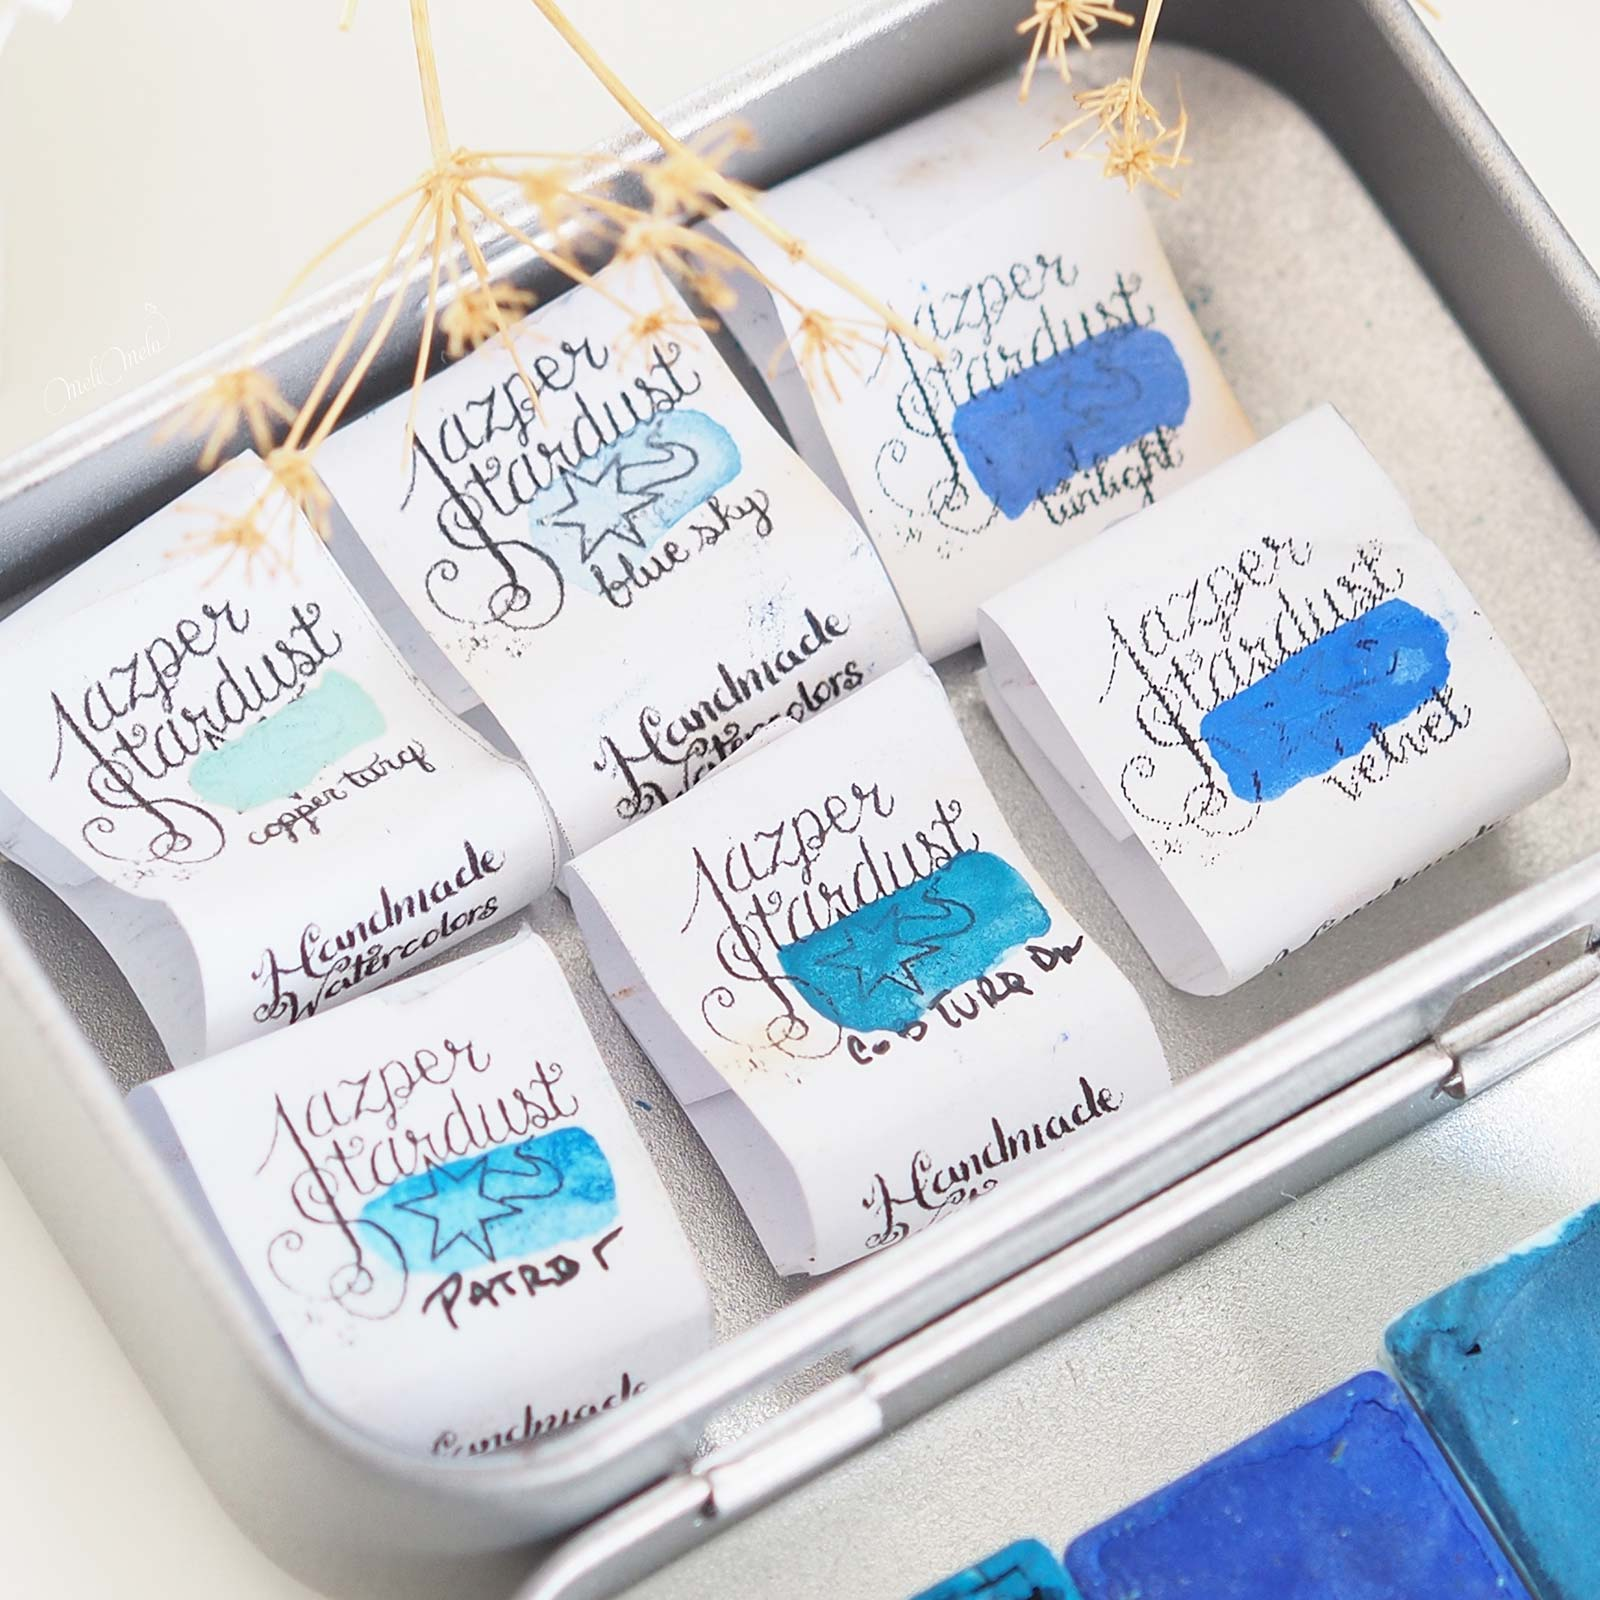 watercolor-blue-handmade-jazper-stardust-aquarelle-laboutiquedemelimelo